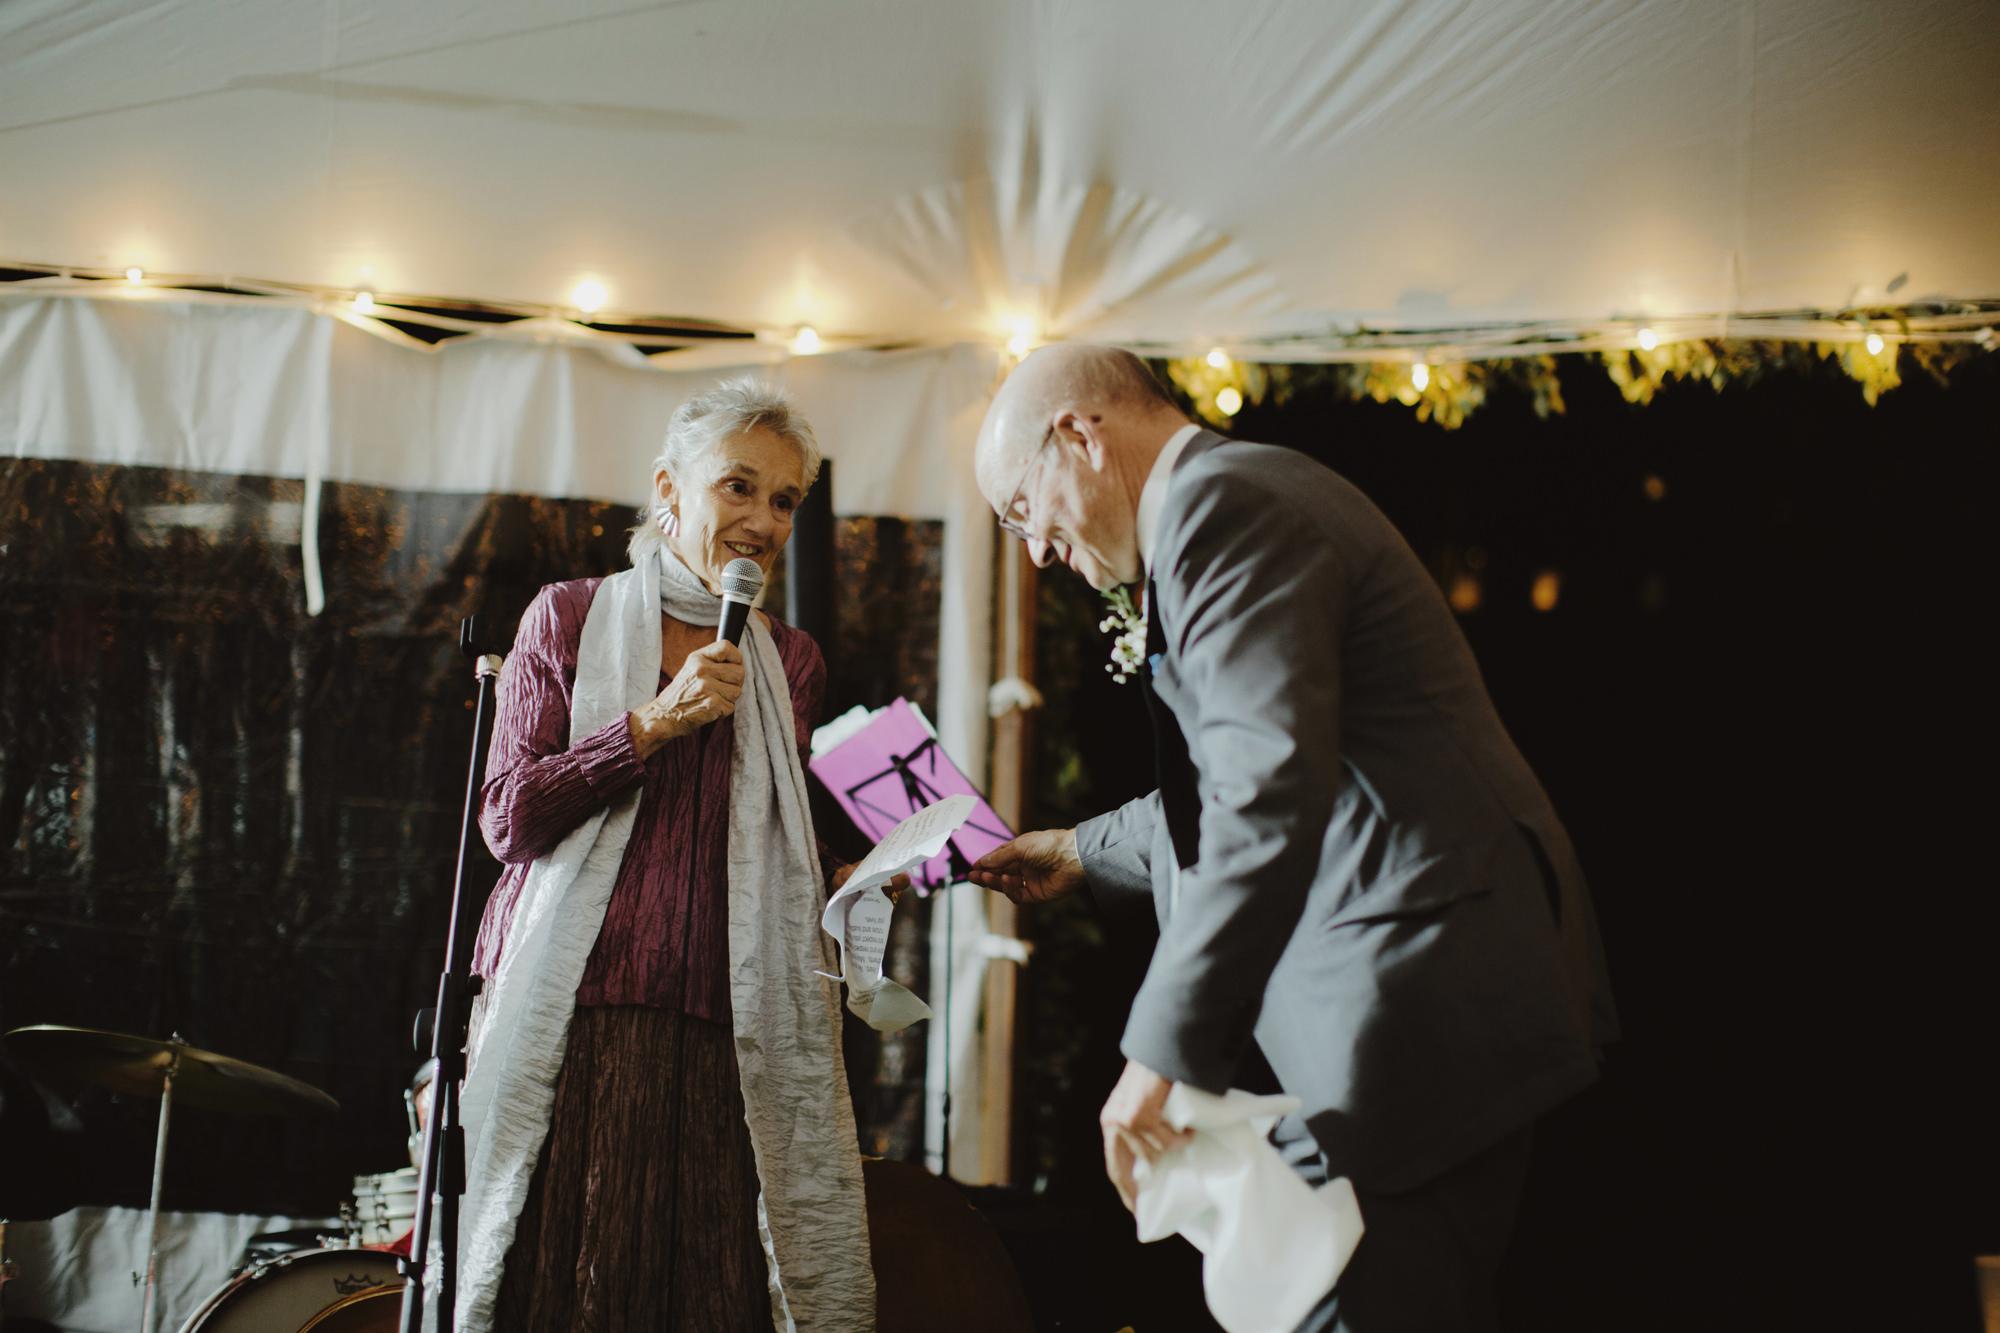 catskills_big_indian_springs_upstate_NY_wedding_sammblake115.jpg